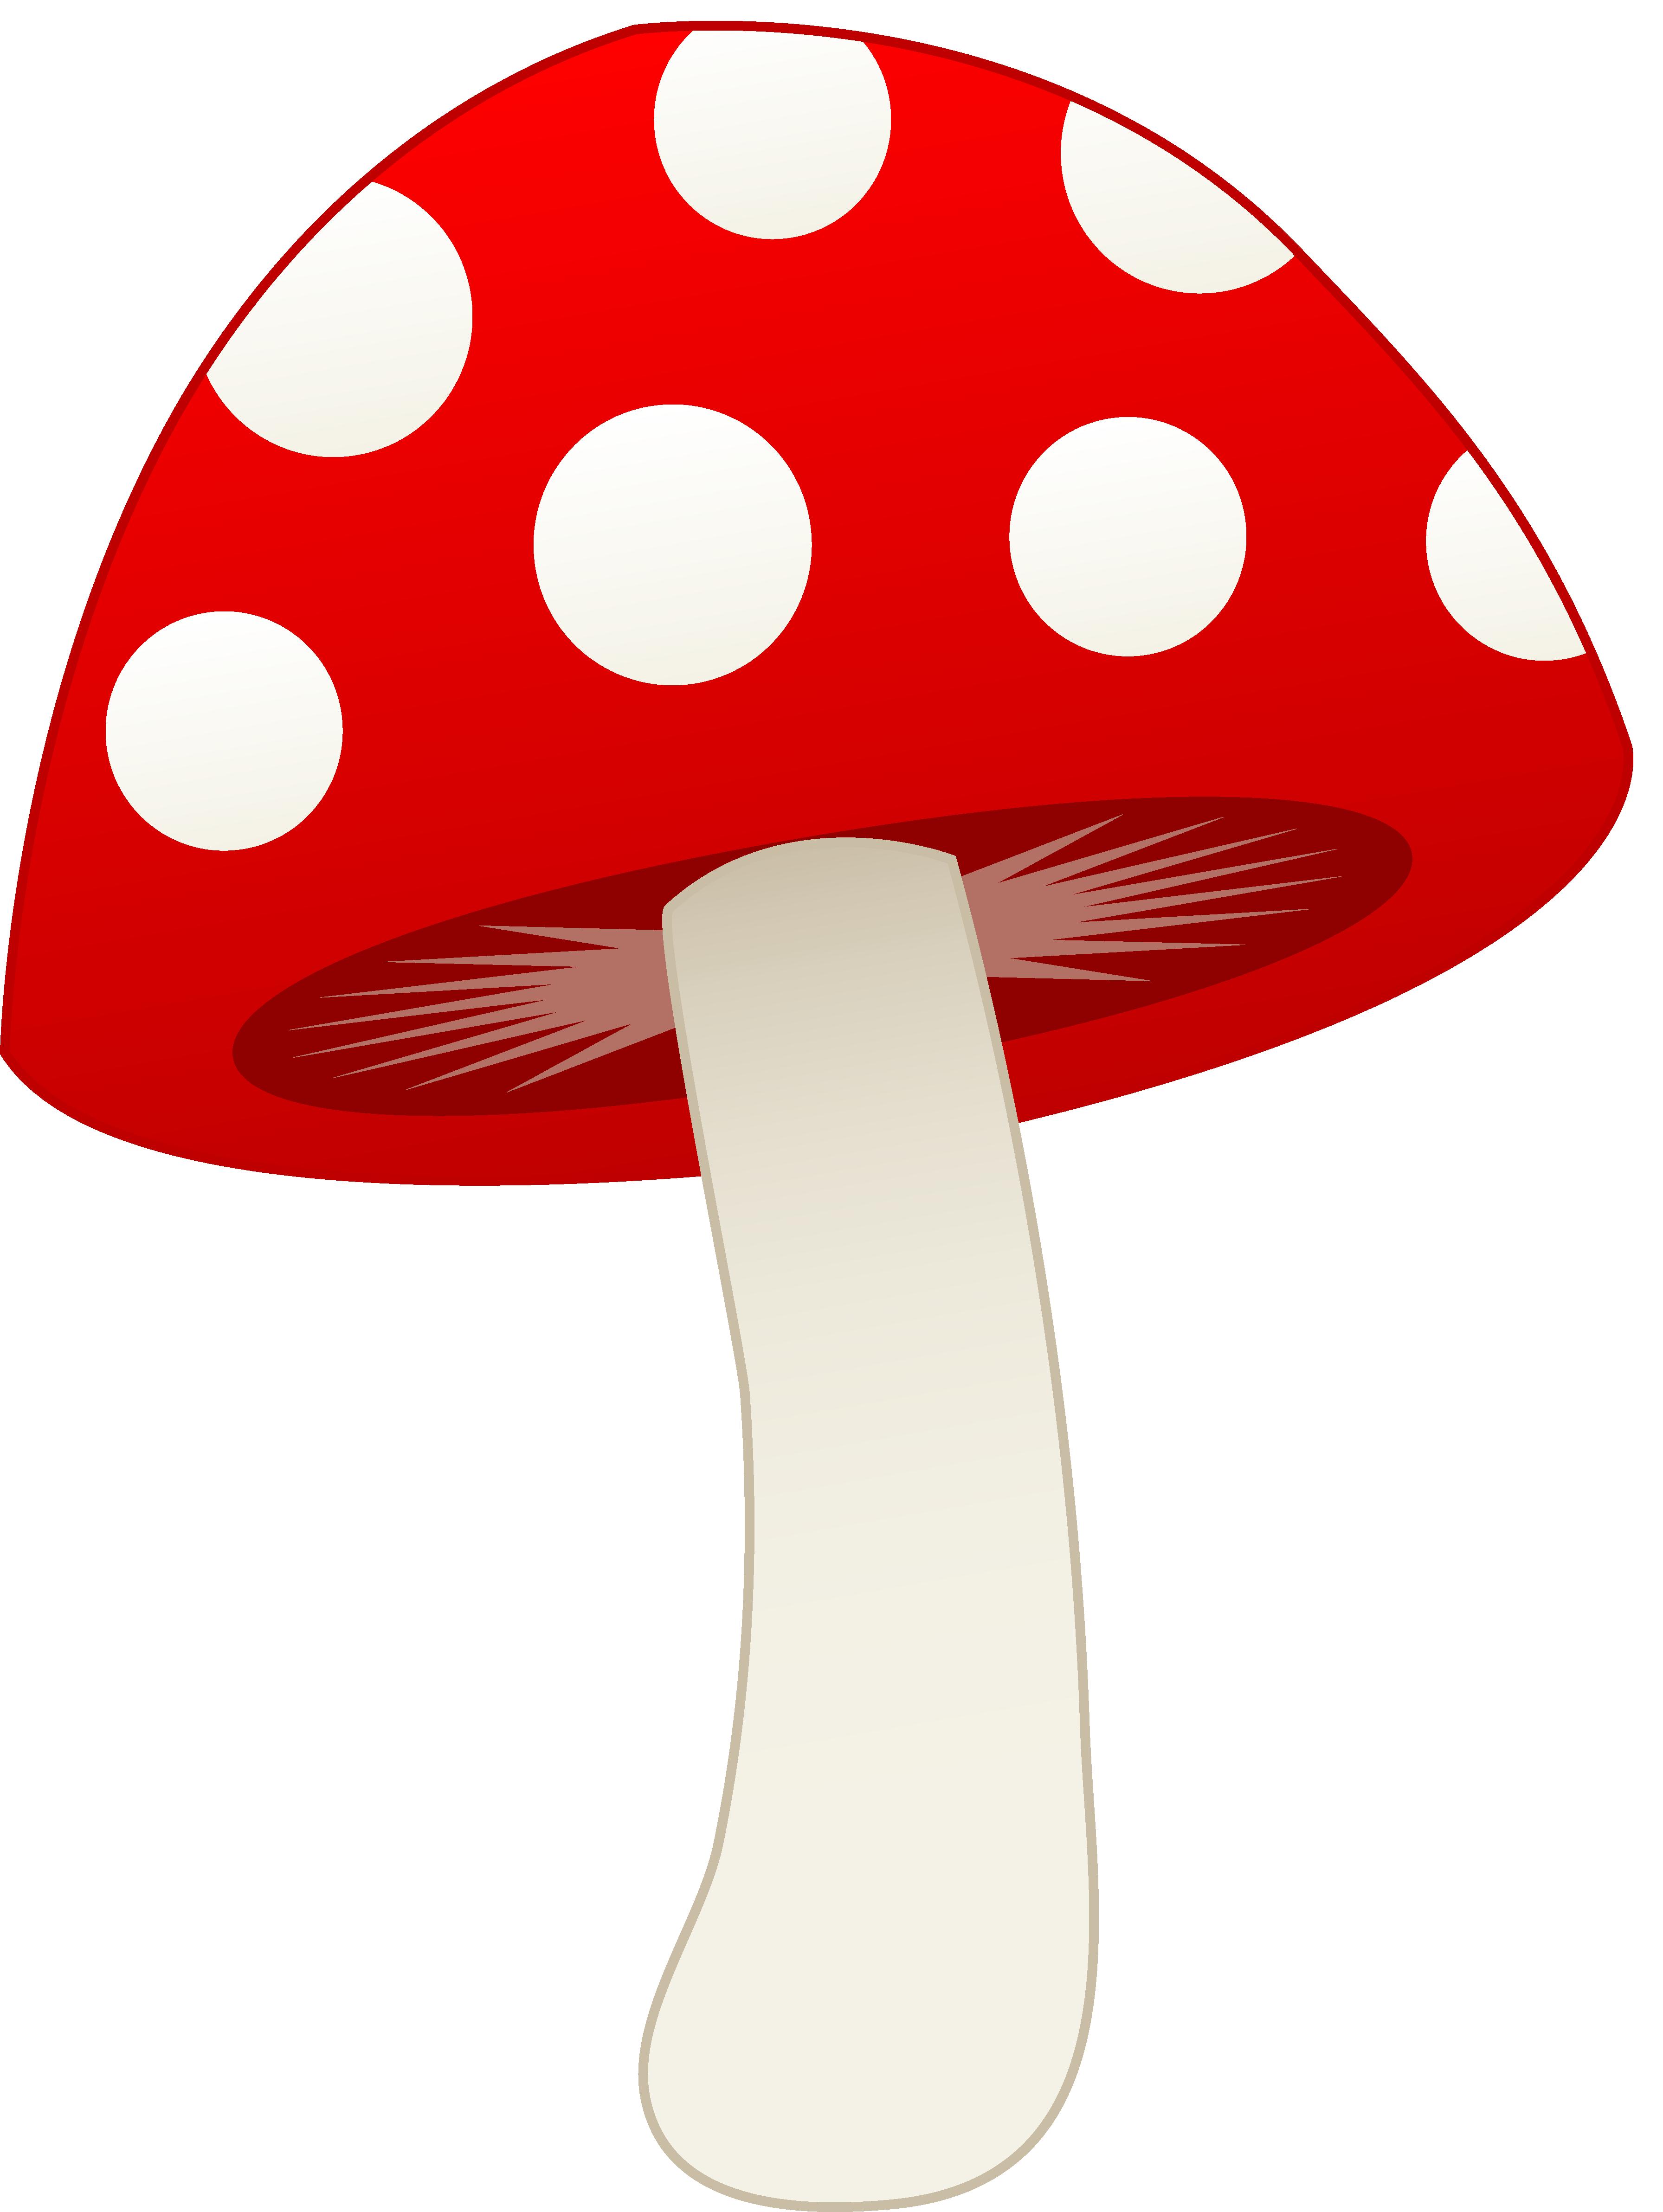 Free Mushroom Cartoon, Download Free Clip Art, Free Clip Art.